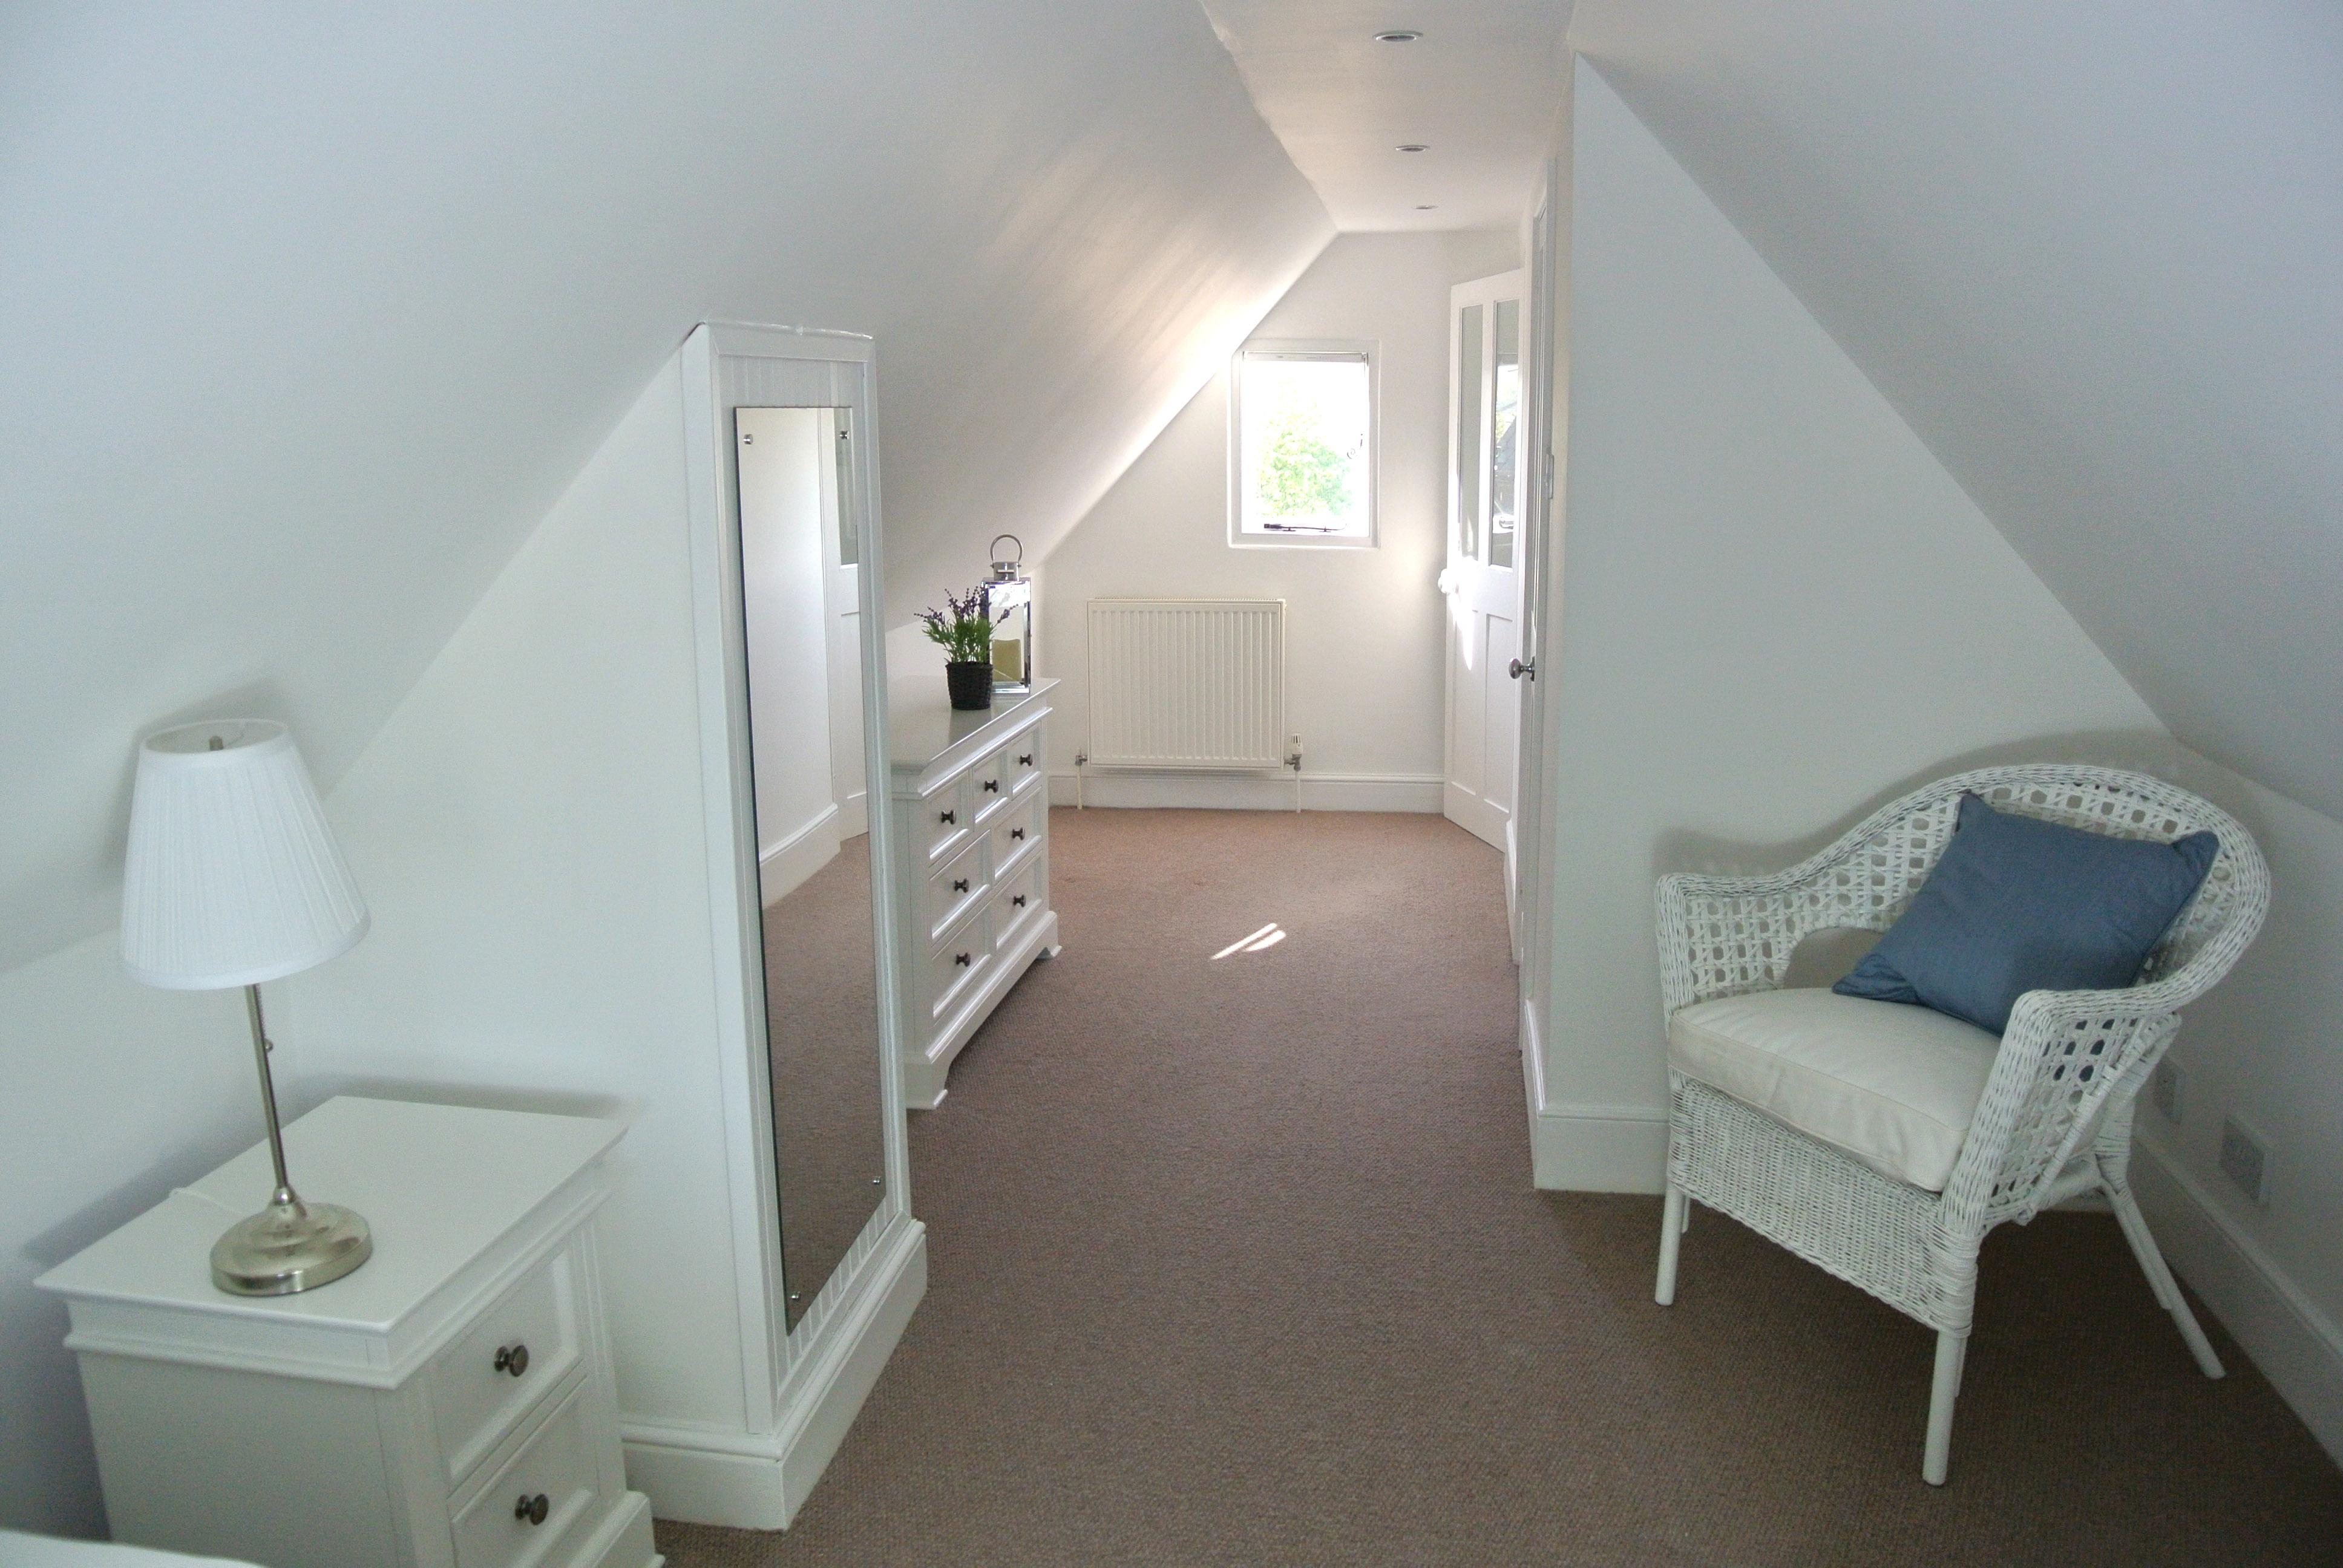 Javelin bedroom